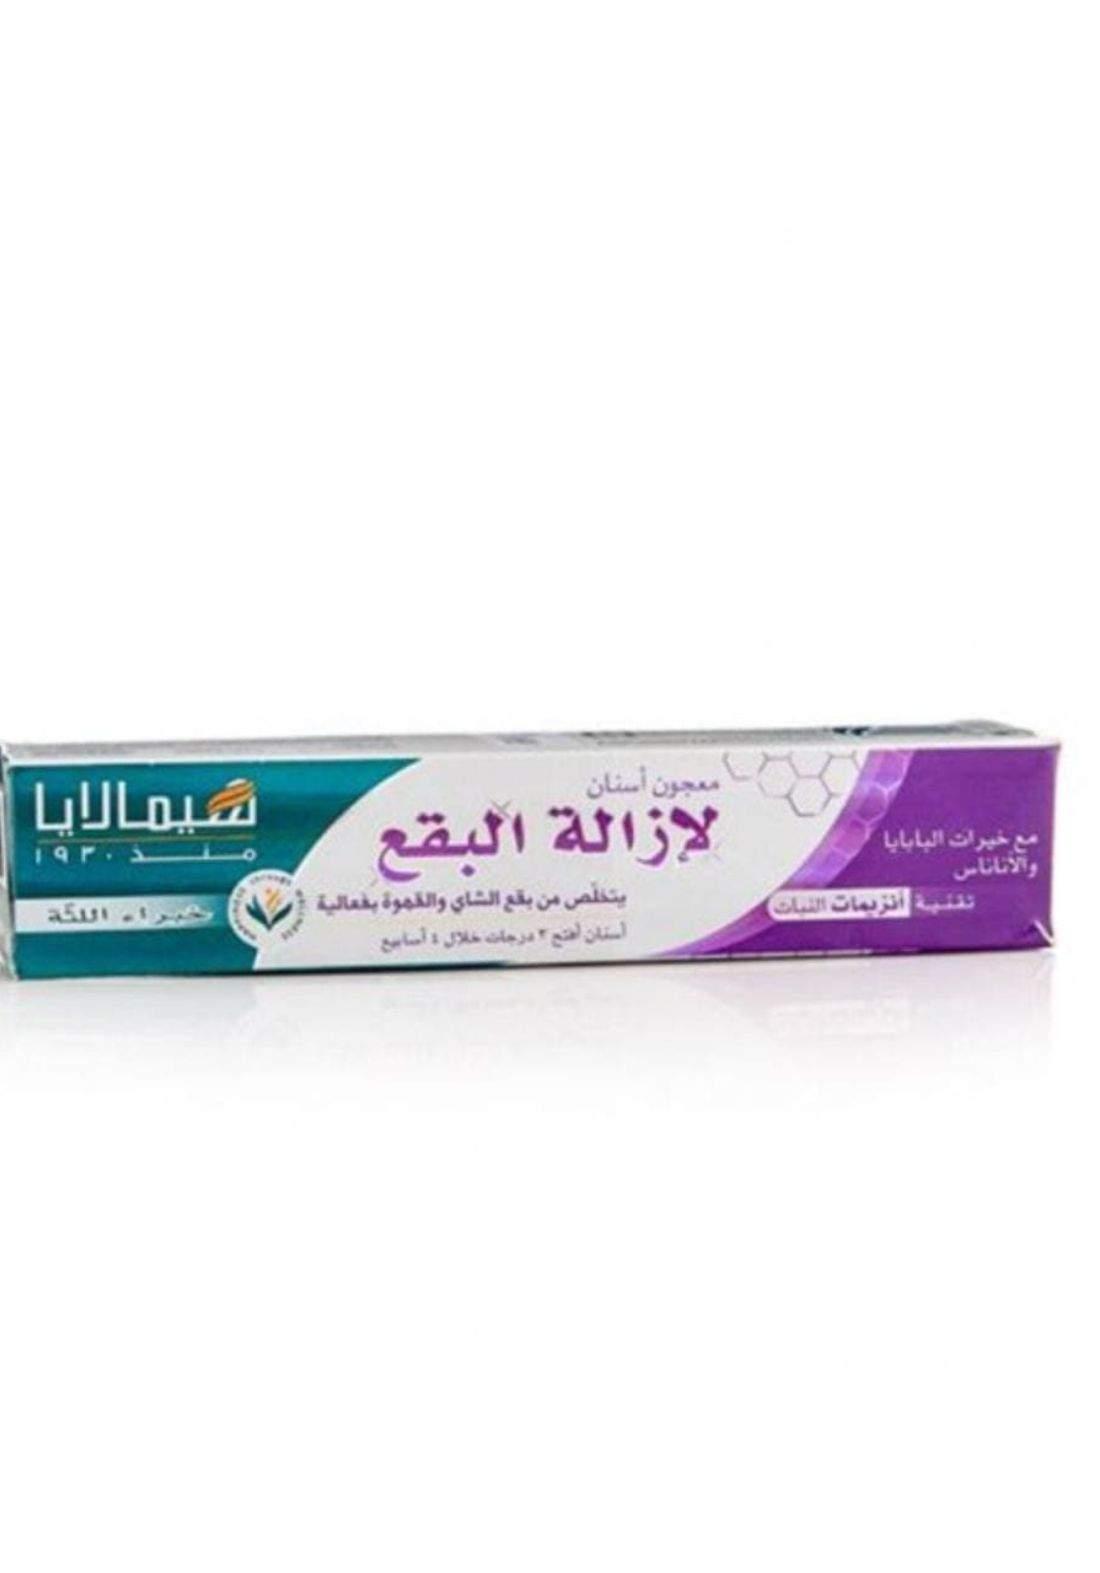 Himalaya herbal tooth paste  stain-away 100ml معجون الاسنان هيمالايا لازالة البقع